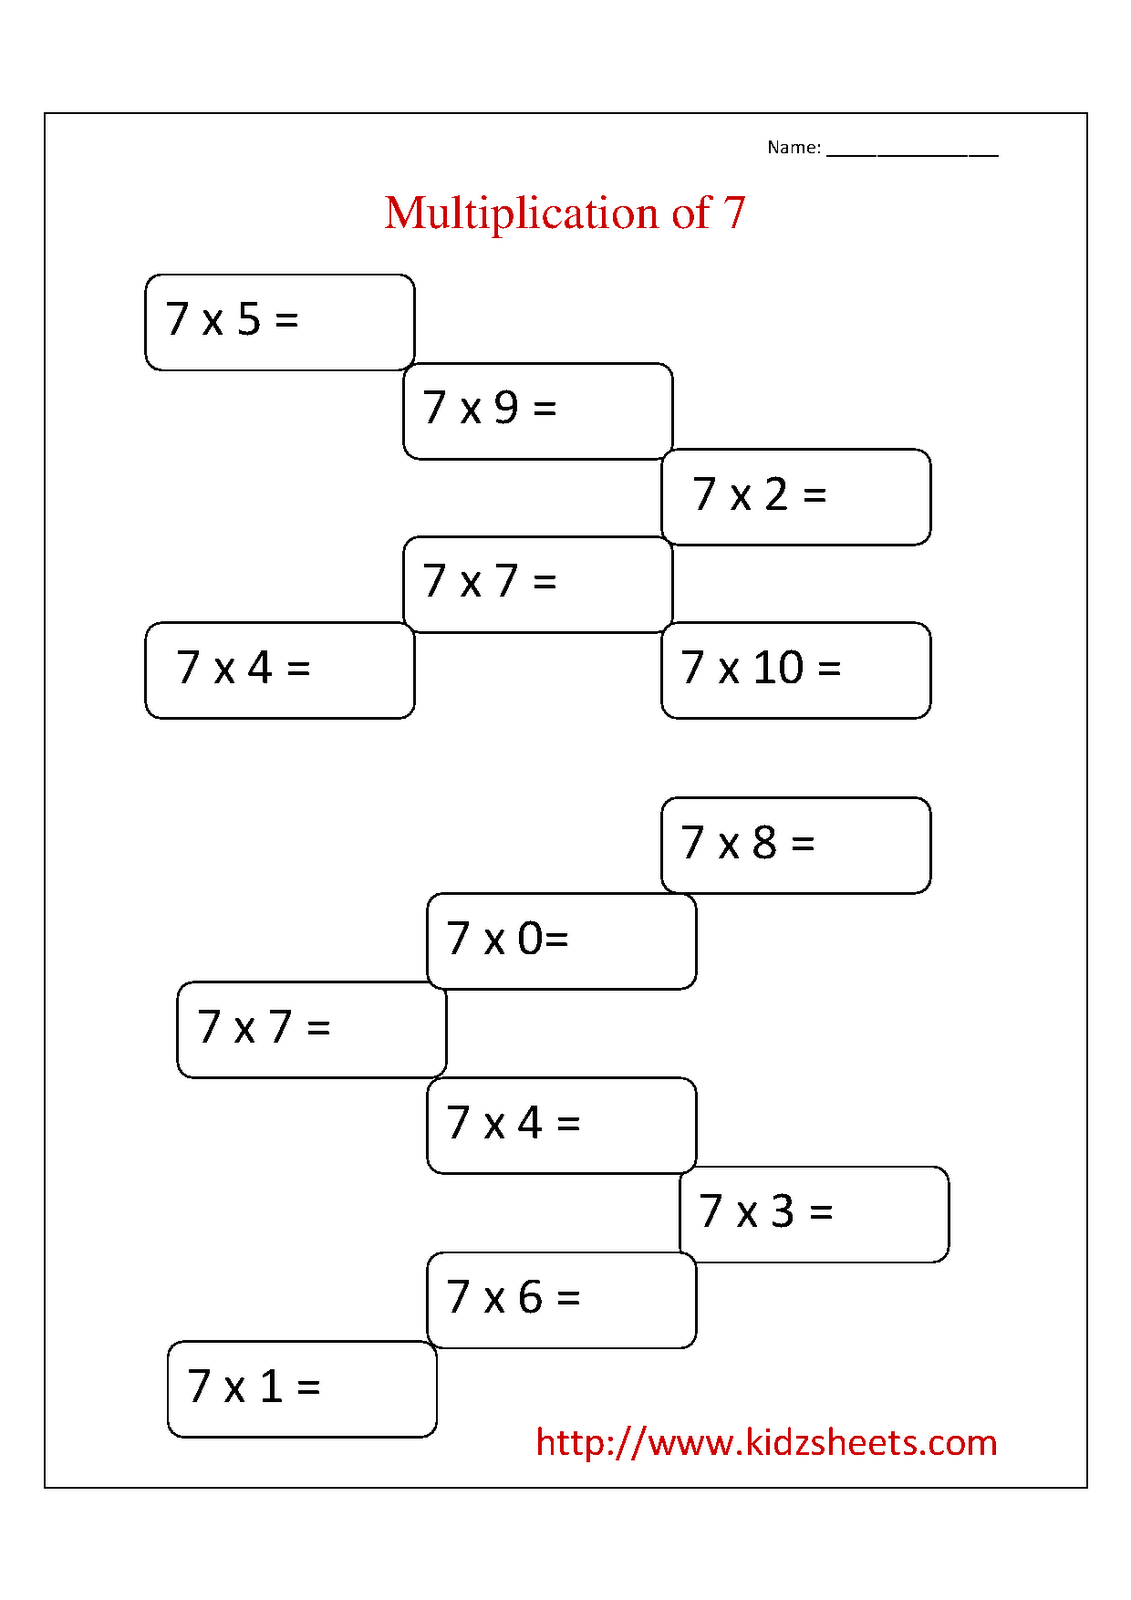 small resolution of Kidz Worksheets: Second Grade Multiplication Table 7